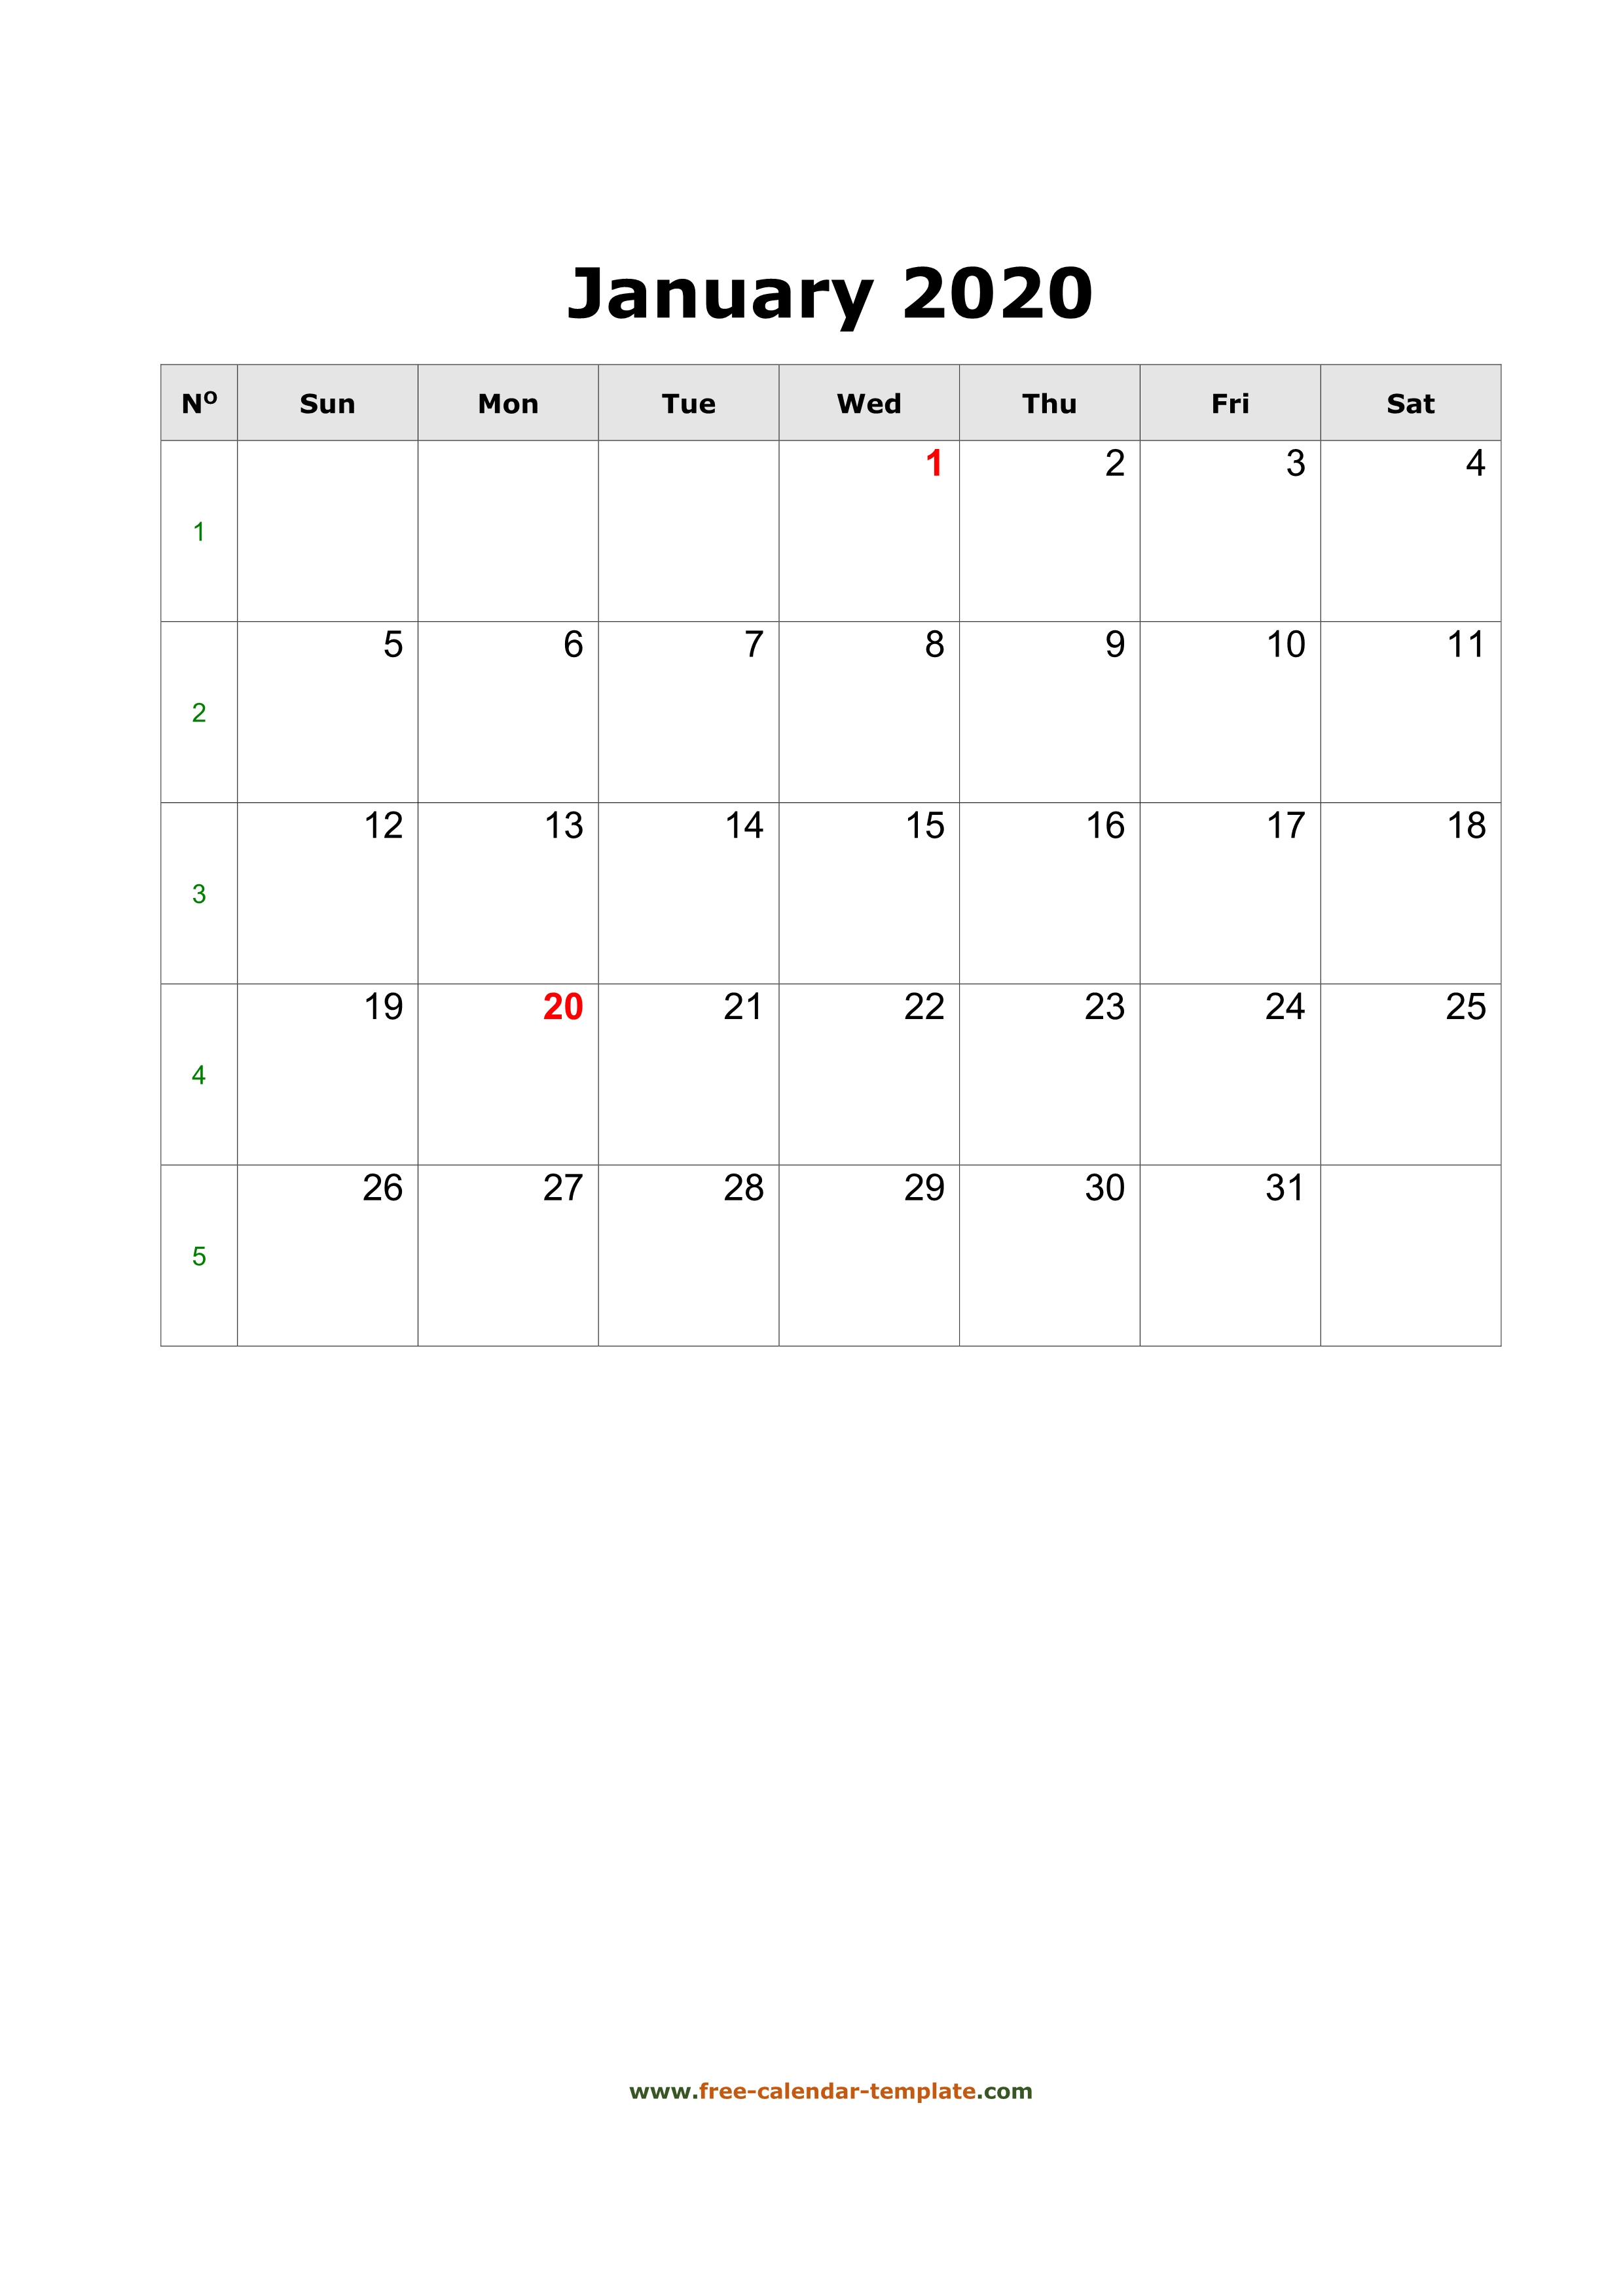 2020 January Calendar (Blank Vertical Template) | Free with regard to 2020 Calendar Vertical